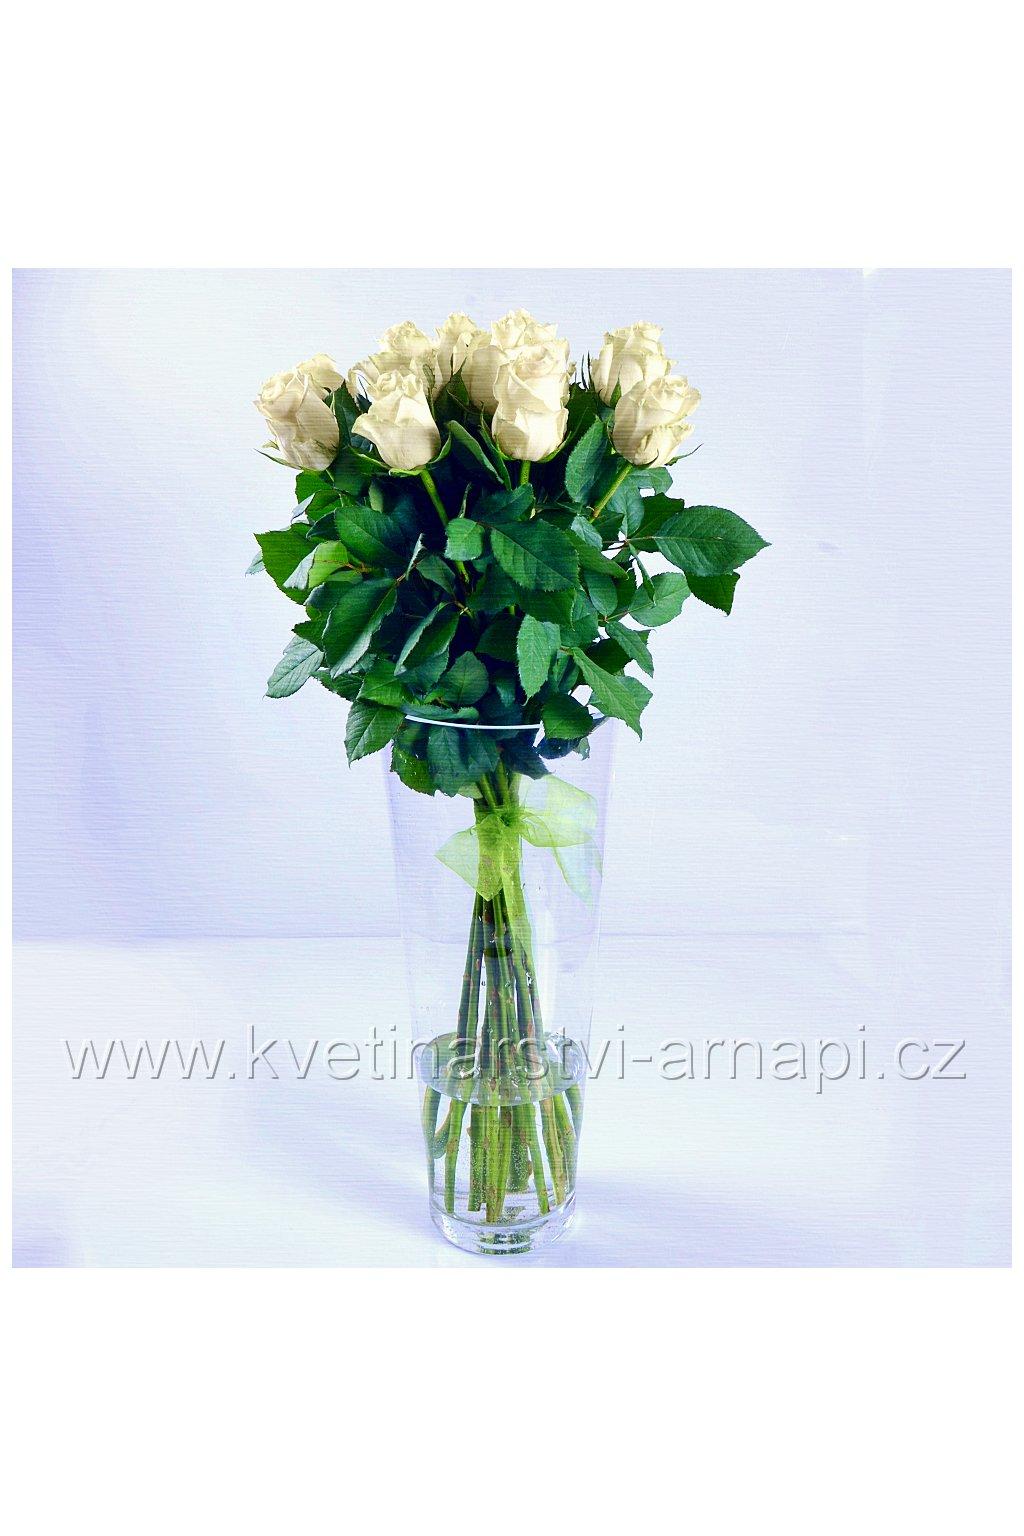 darkova kytice ruze kvetinarstvi arnapi